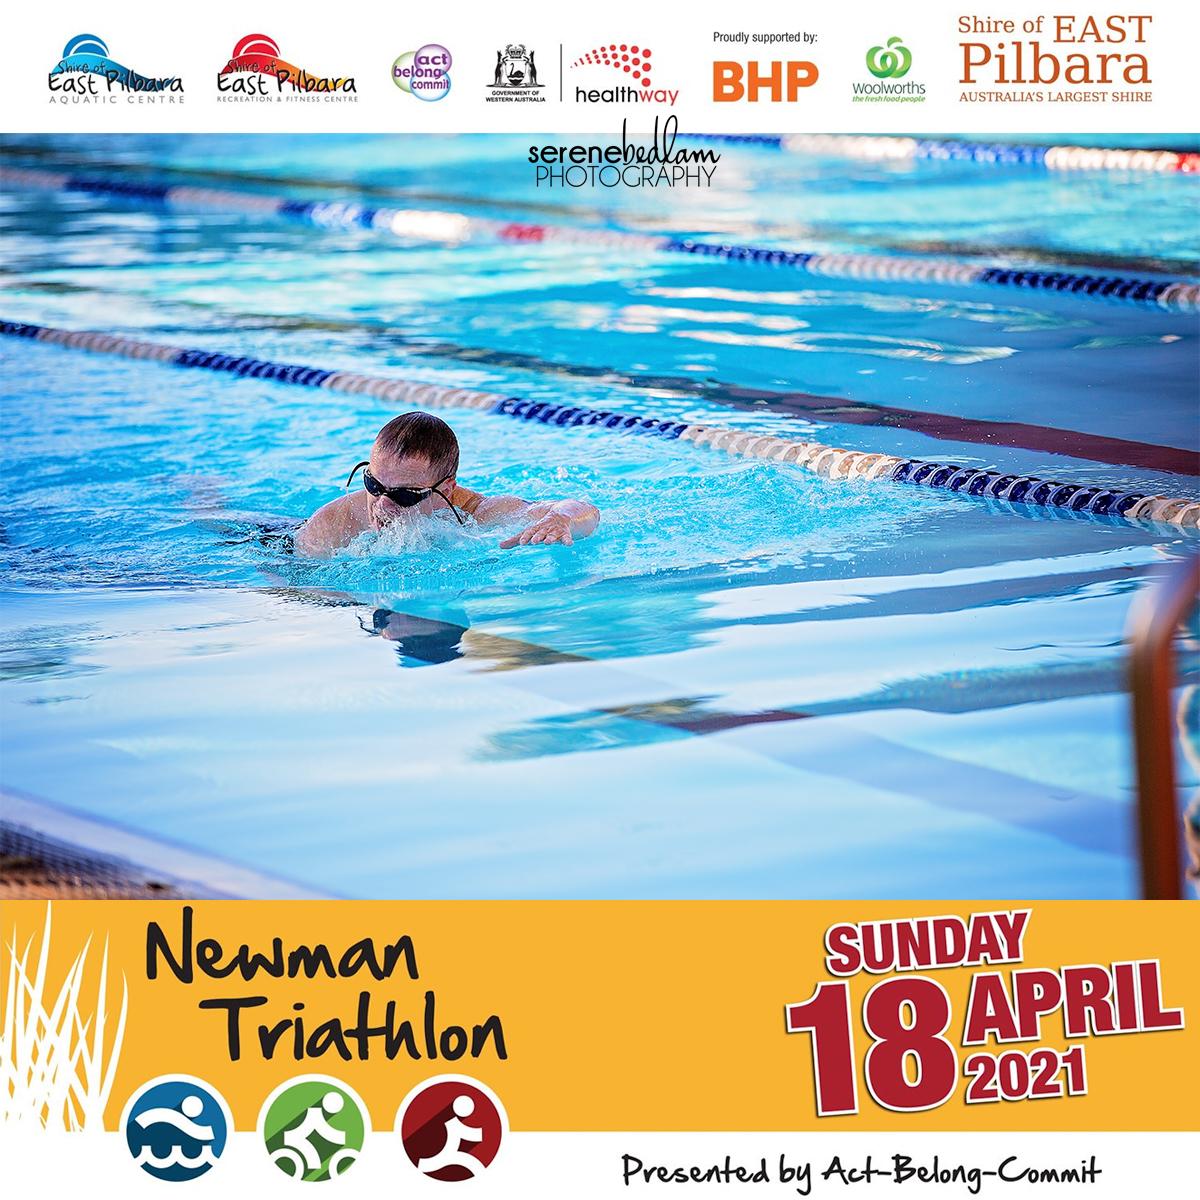 triathlon newman sport photography